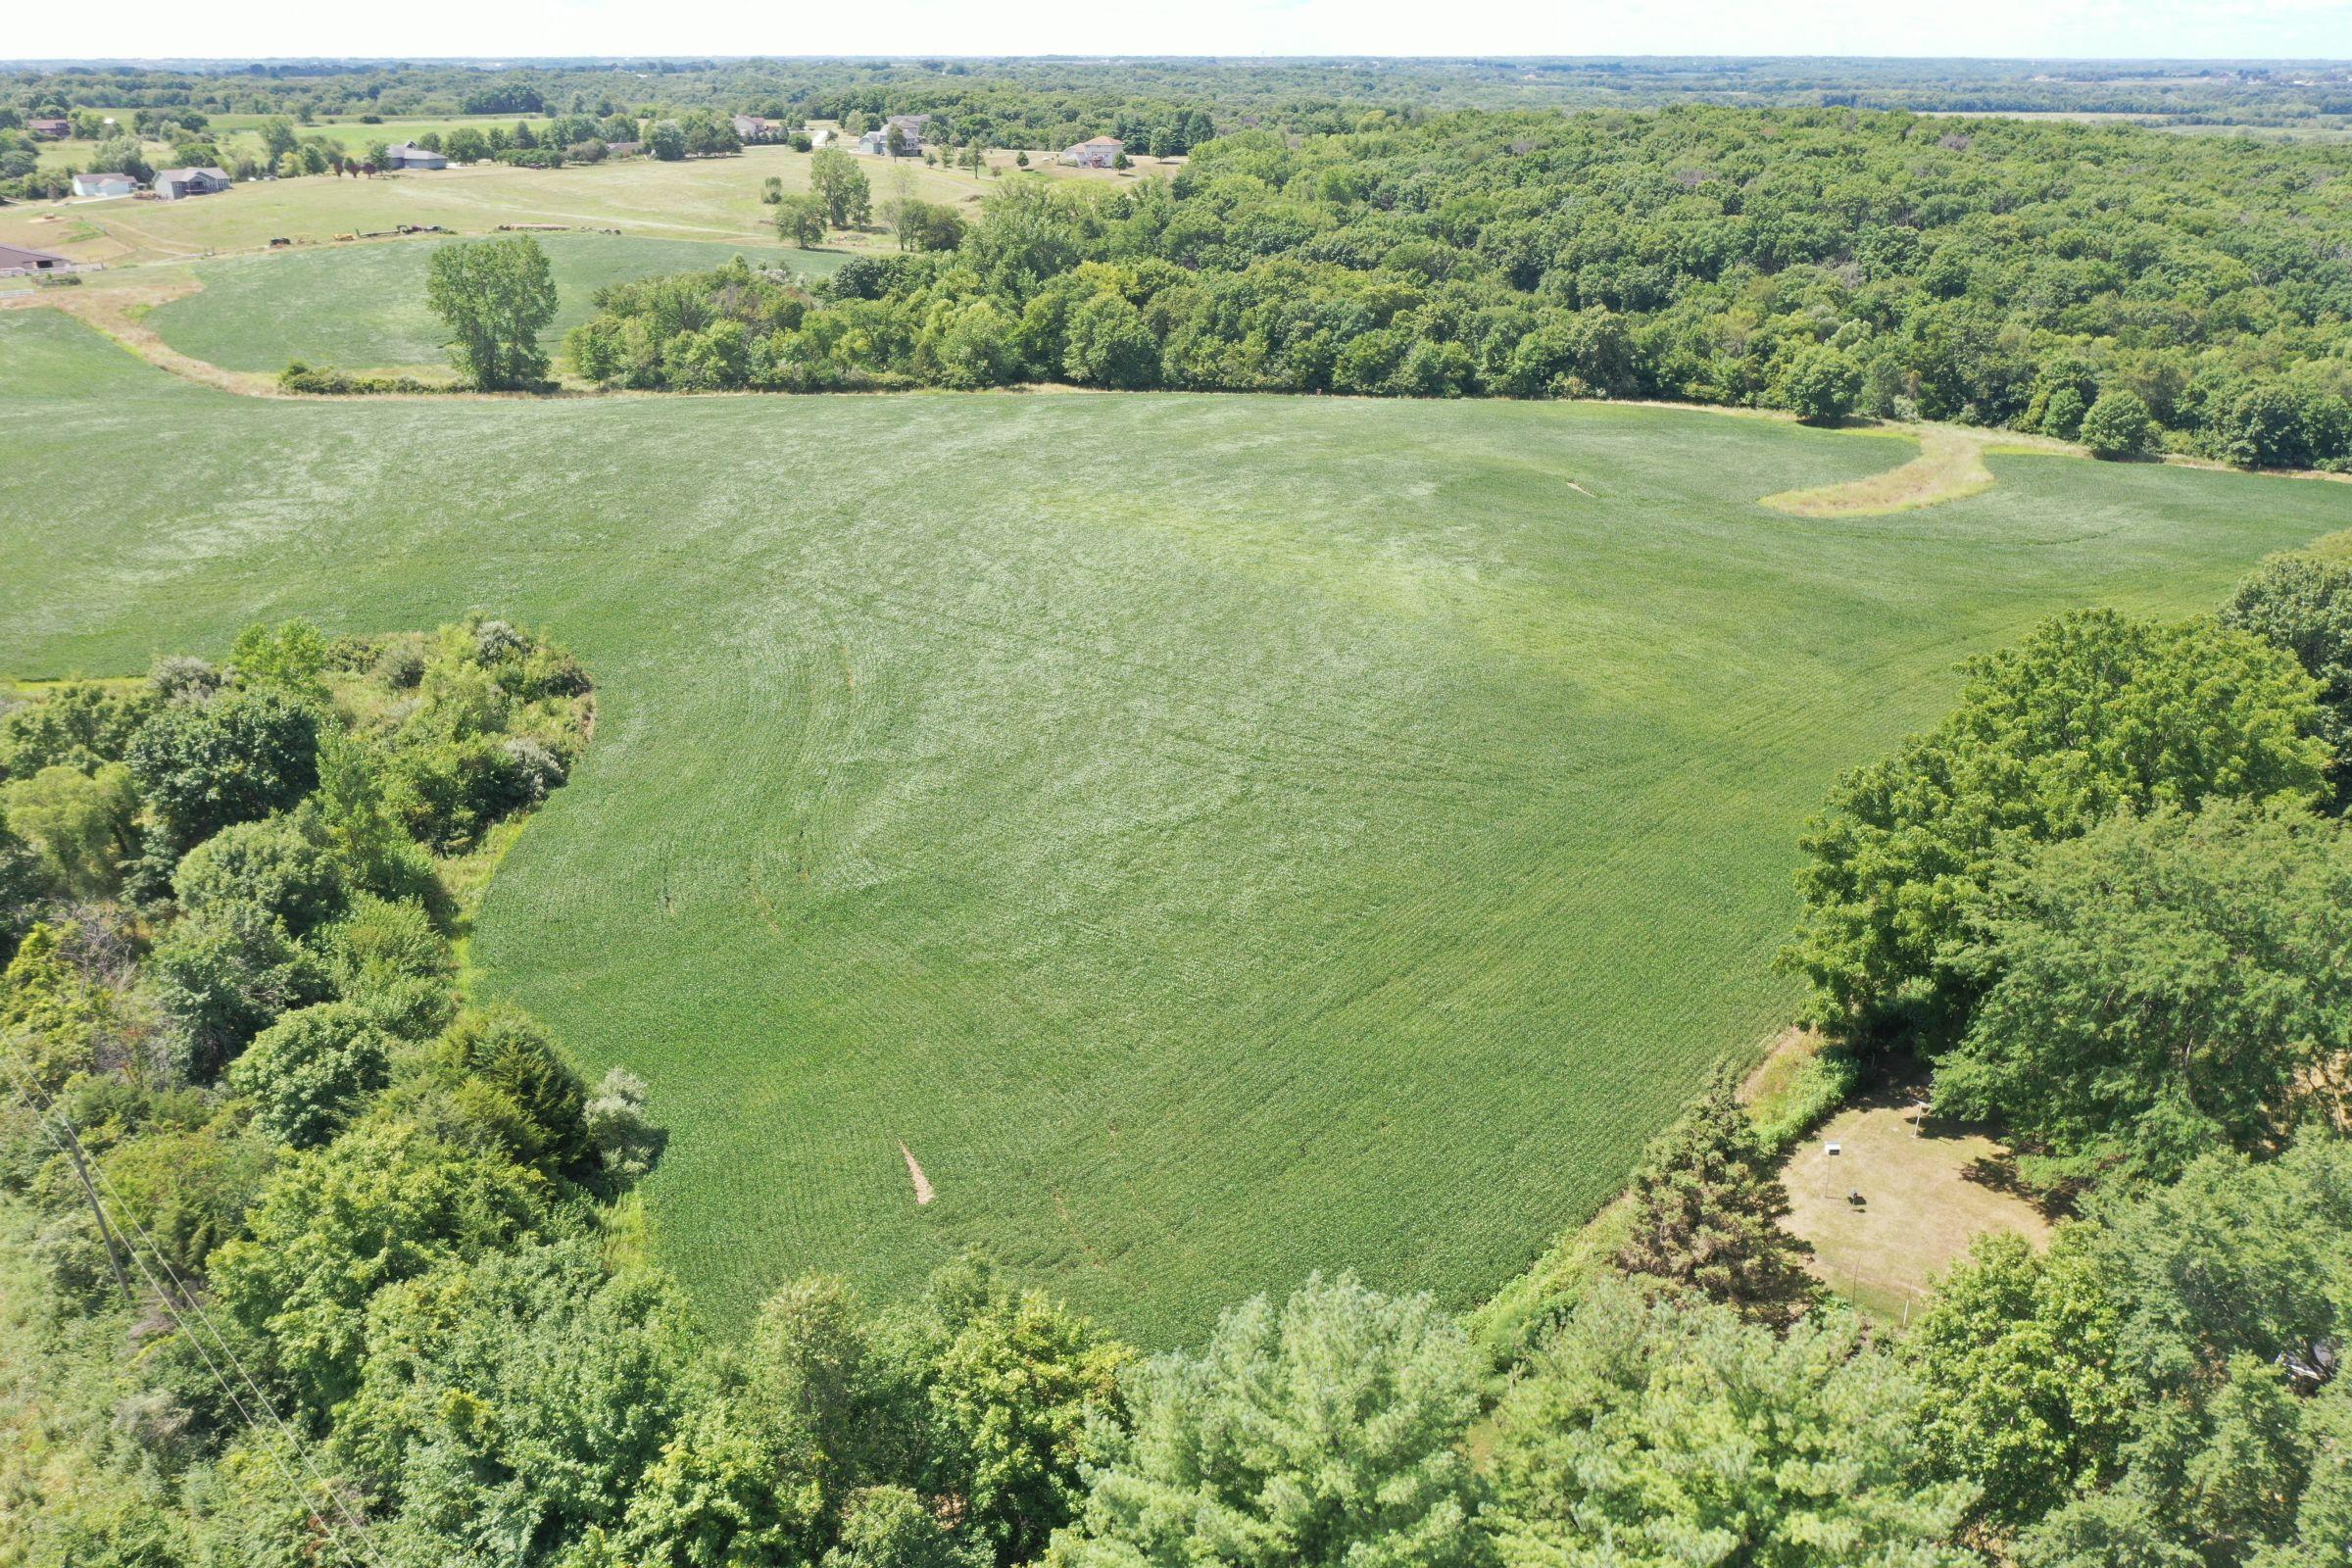 development-land-warren-county-iowa-38-acres-listing-number-15513-0-2021-05-06-172518.JPG